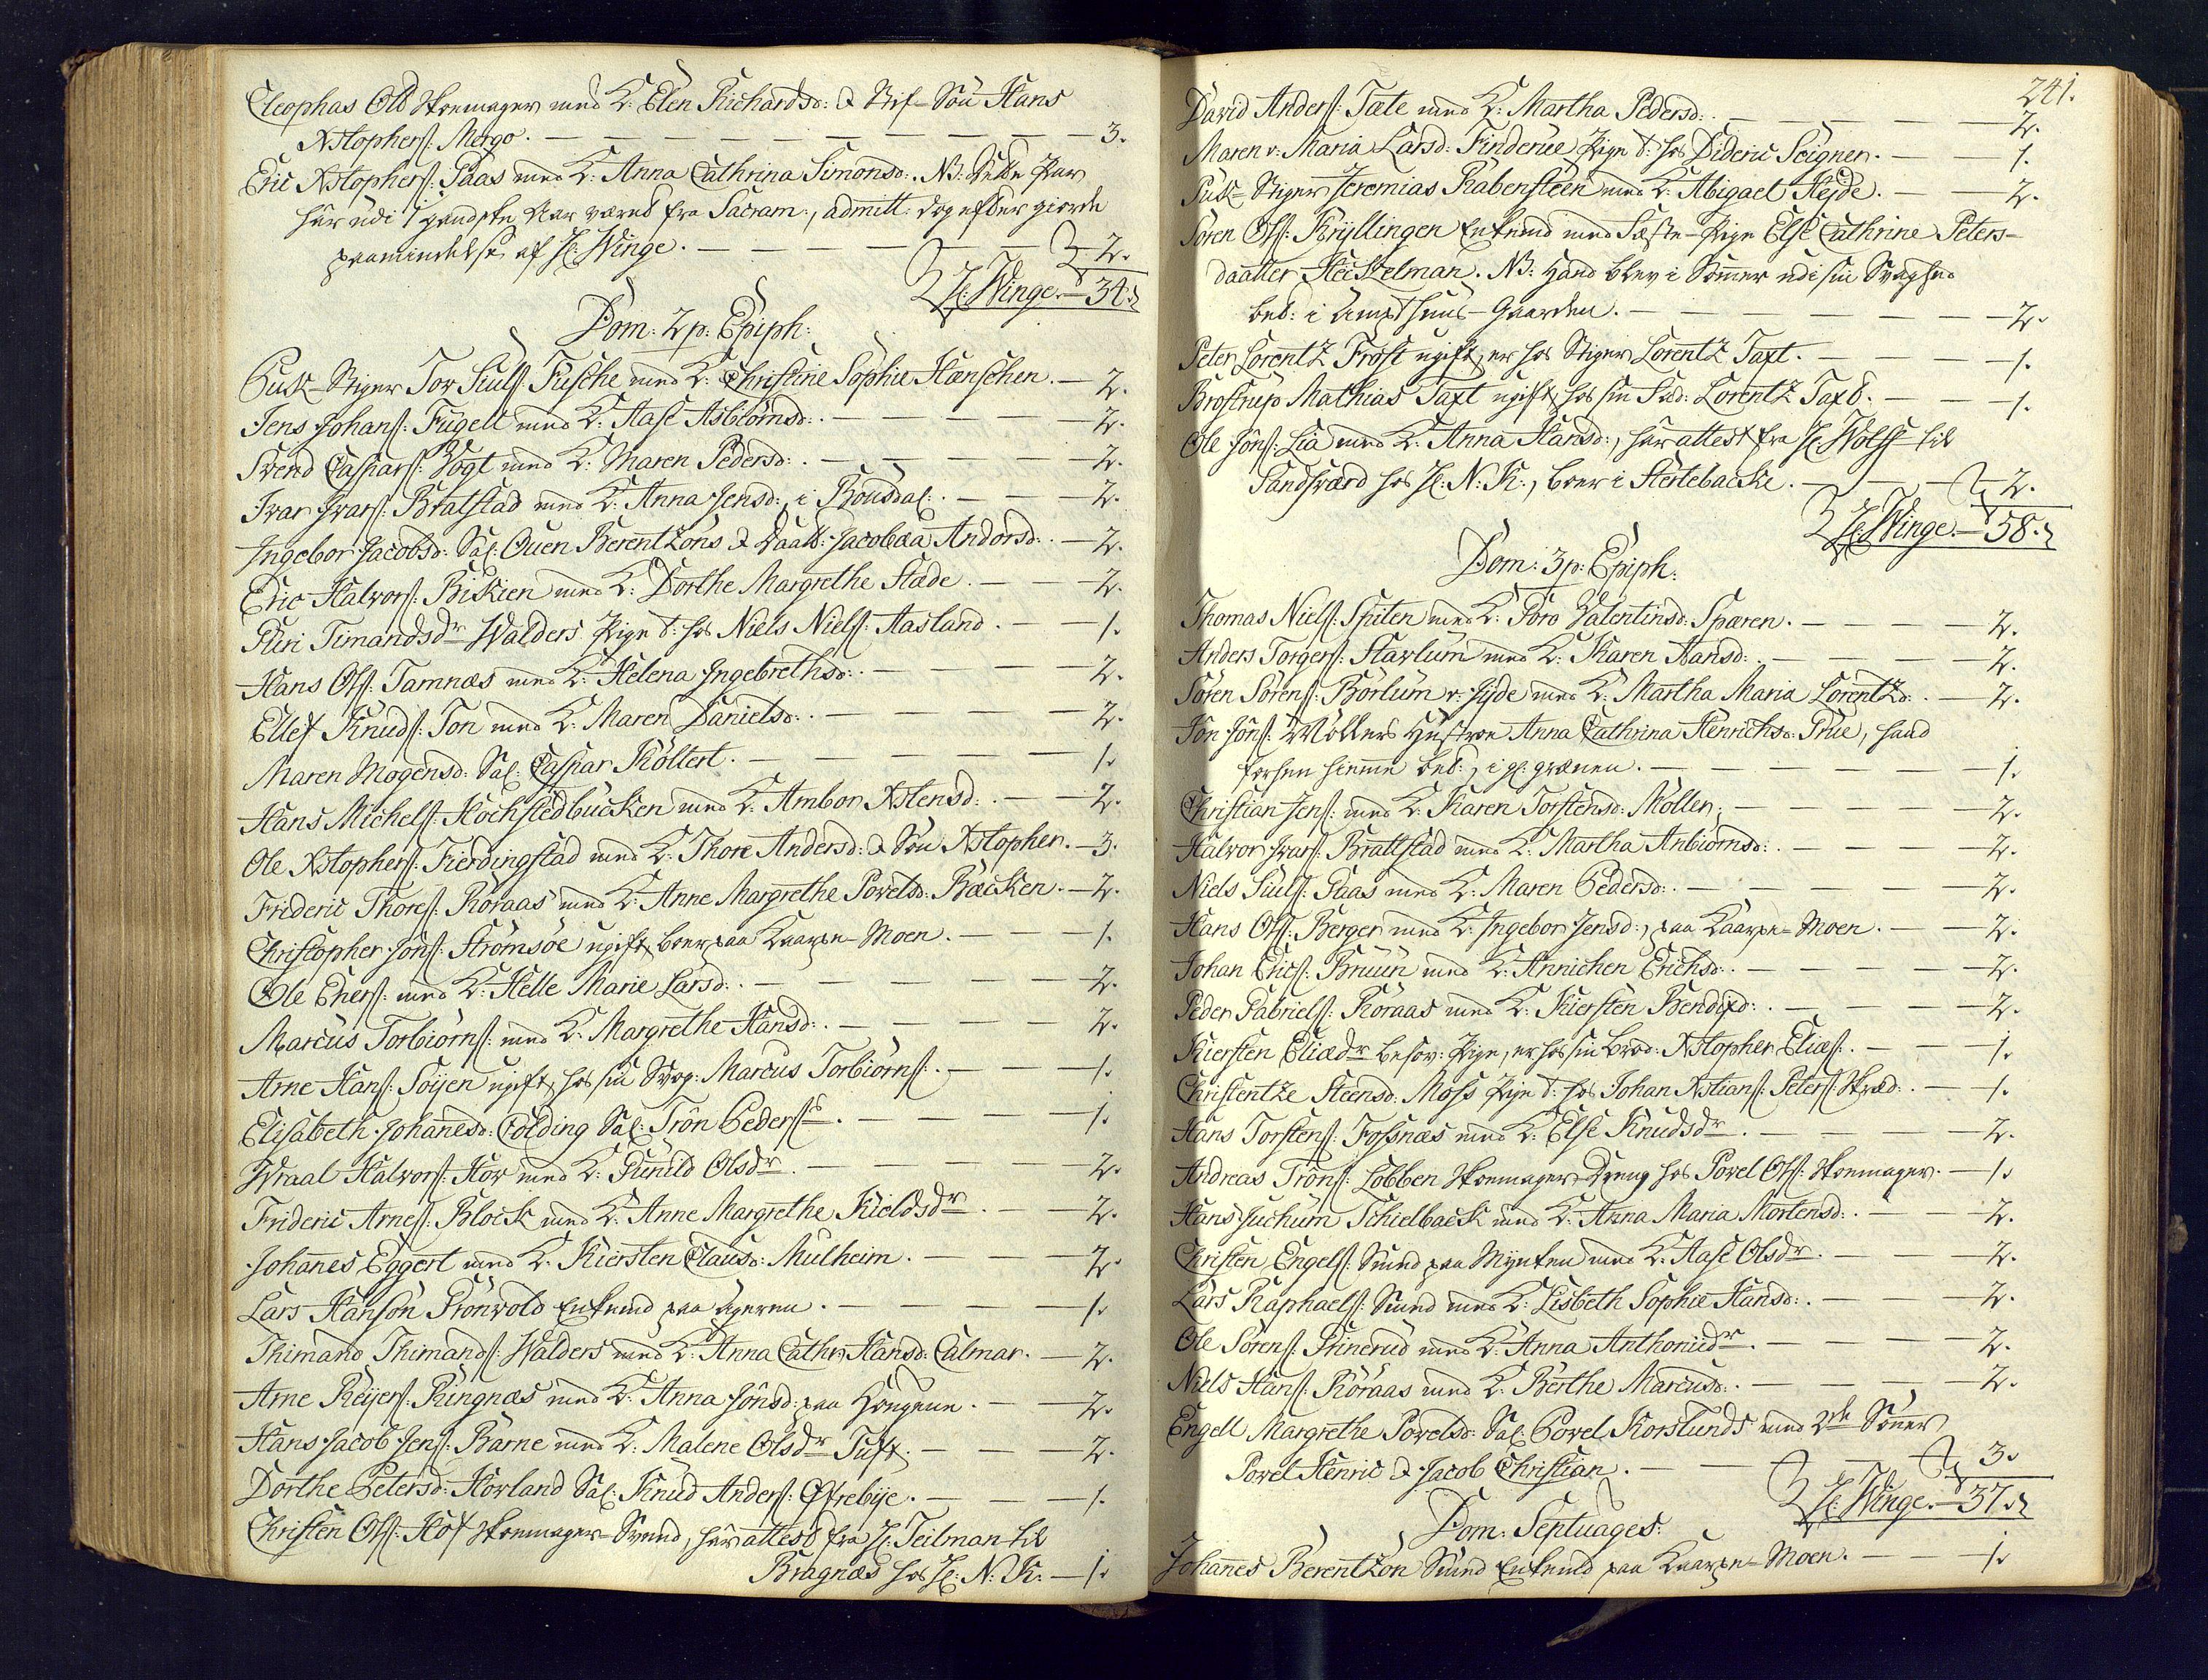 SAKO, Kongsberg kirkebøker, M/Ma/L0005: Kommunikantprotokoll nr. 5, 1755-1761, s. 241